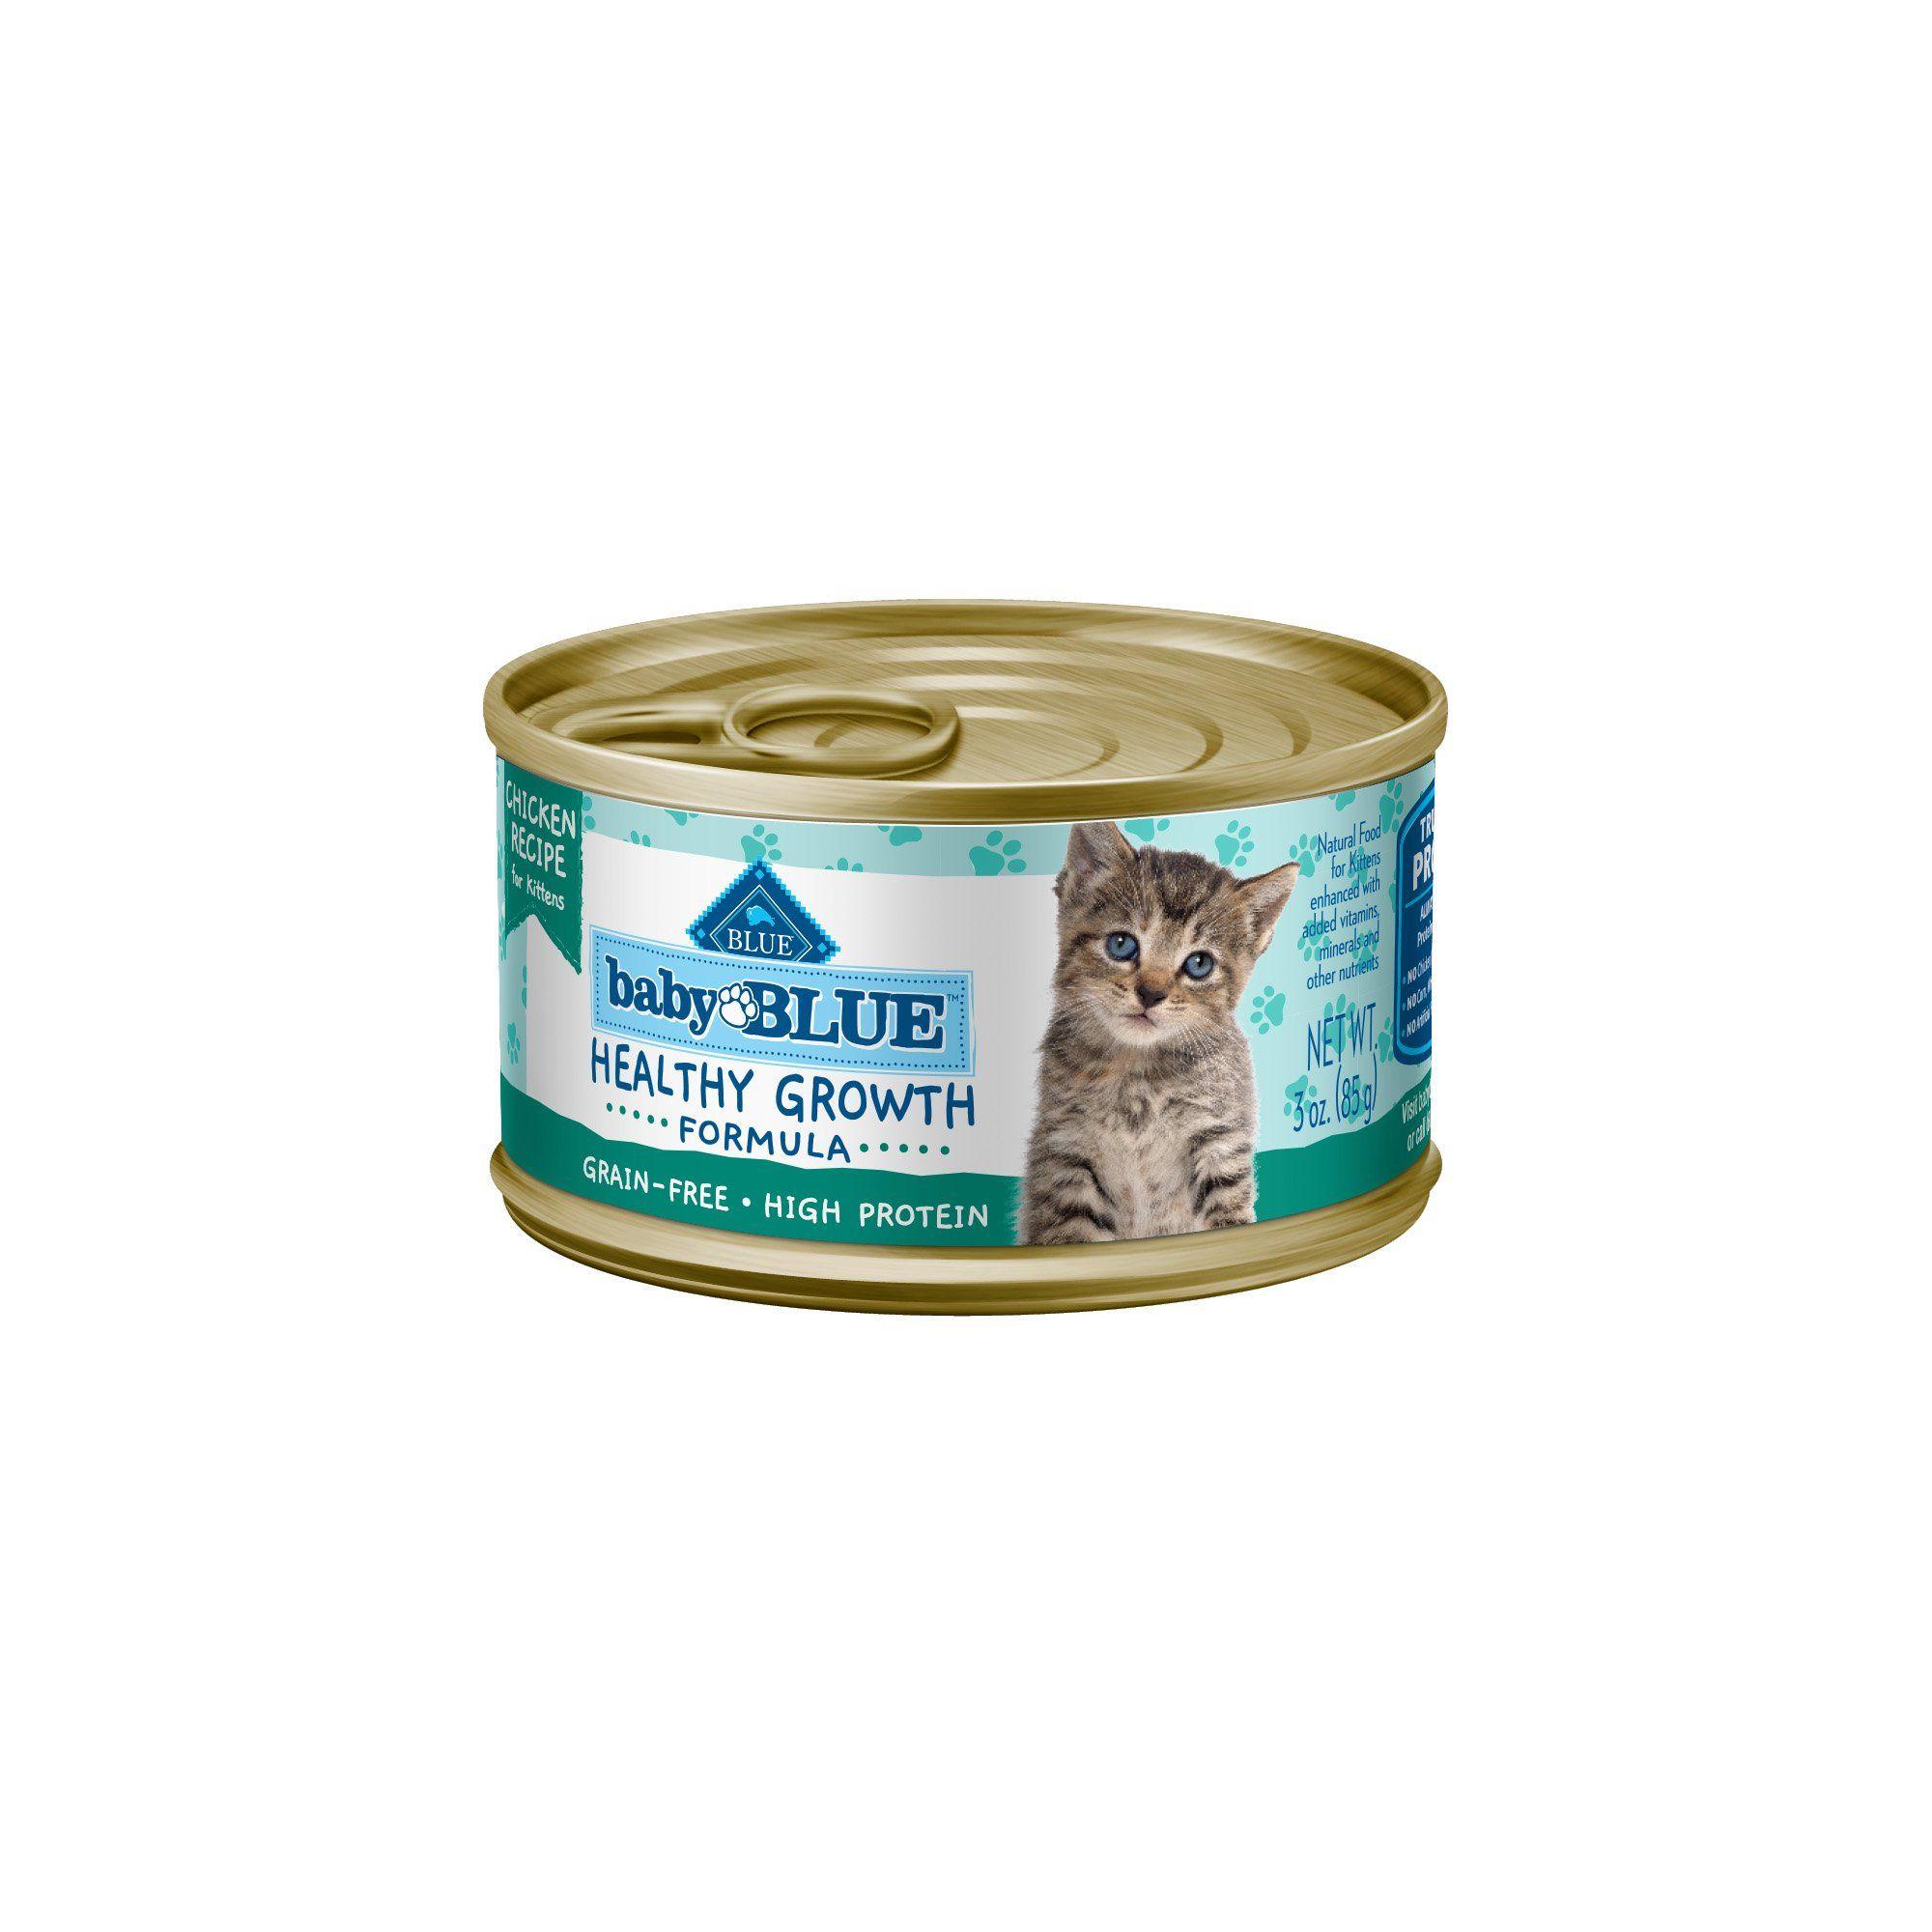 Blue Buffalo Baby Blue Healthy Growth Formula Natural Grain Free Chicken Recipe Kitten Pate Wet Food 3 Oz Case Of 24 24 X 3 Oz In 2020 Grain Free Salmon Recipes Baby Buffalo